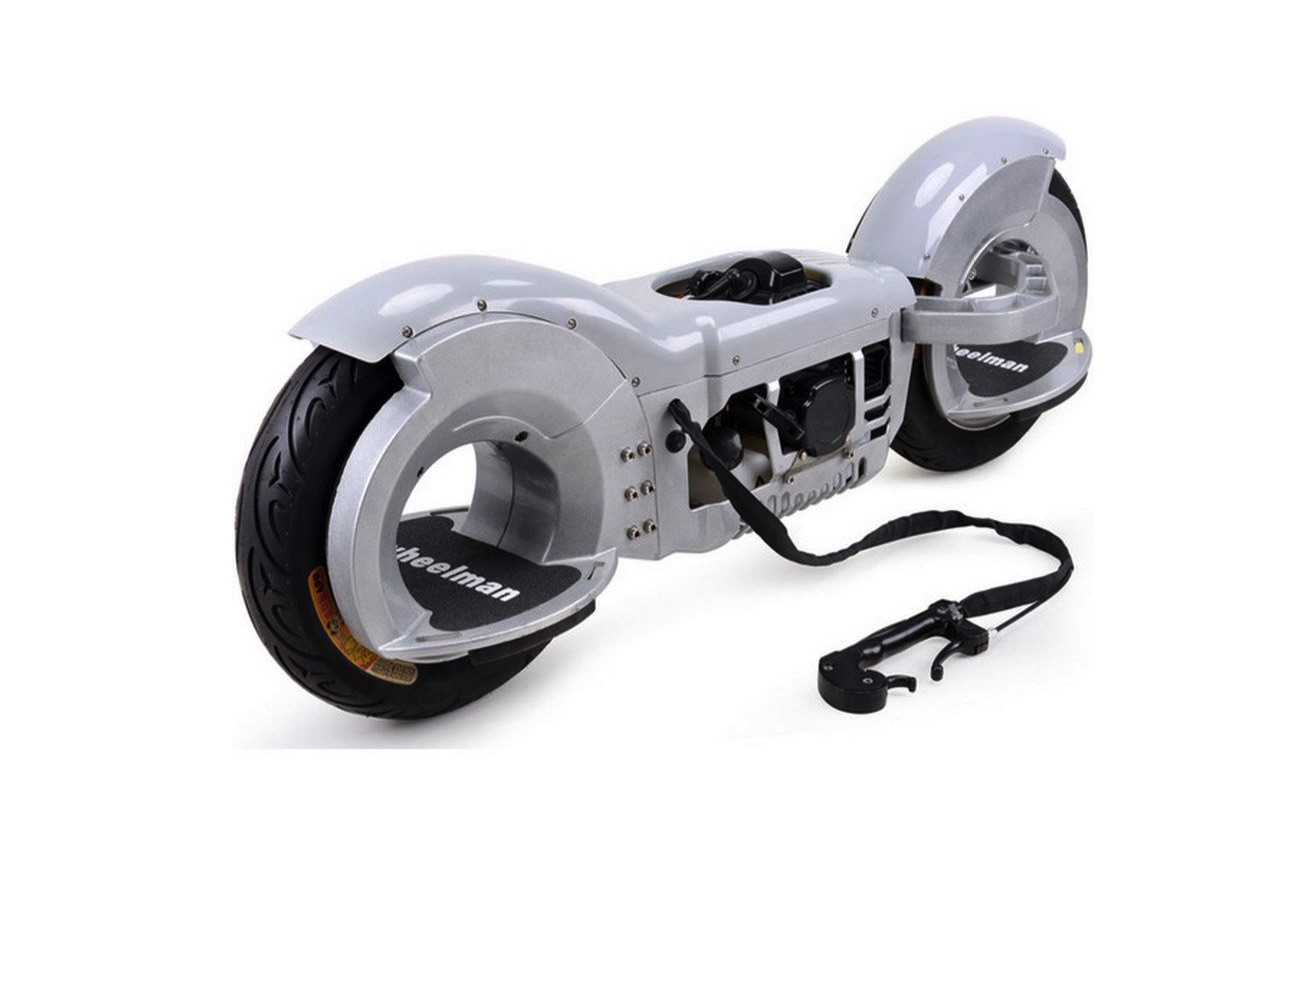 Wheelman 50cc Gas Skateboard » Gadget Flow